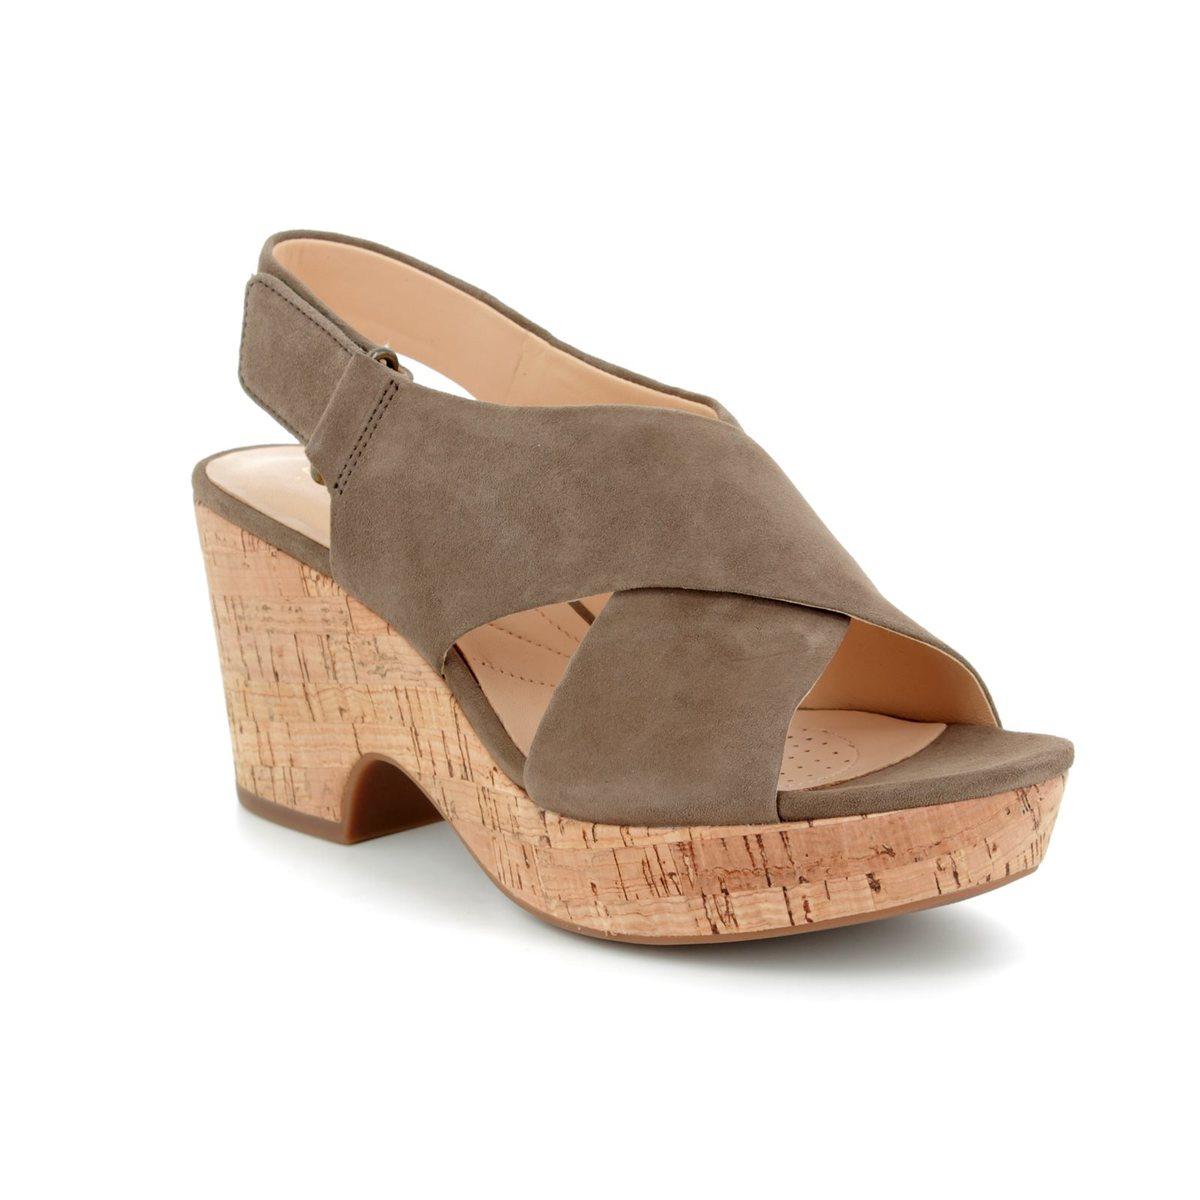 9775fe284b8 Clarks Heeled Sandals - Olive - 3381 74D MARITSA LARA